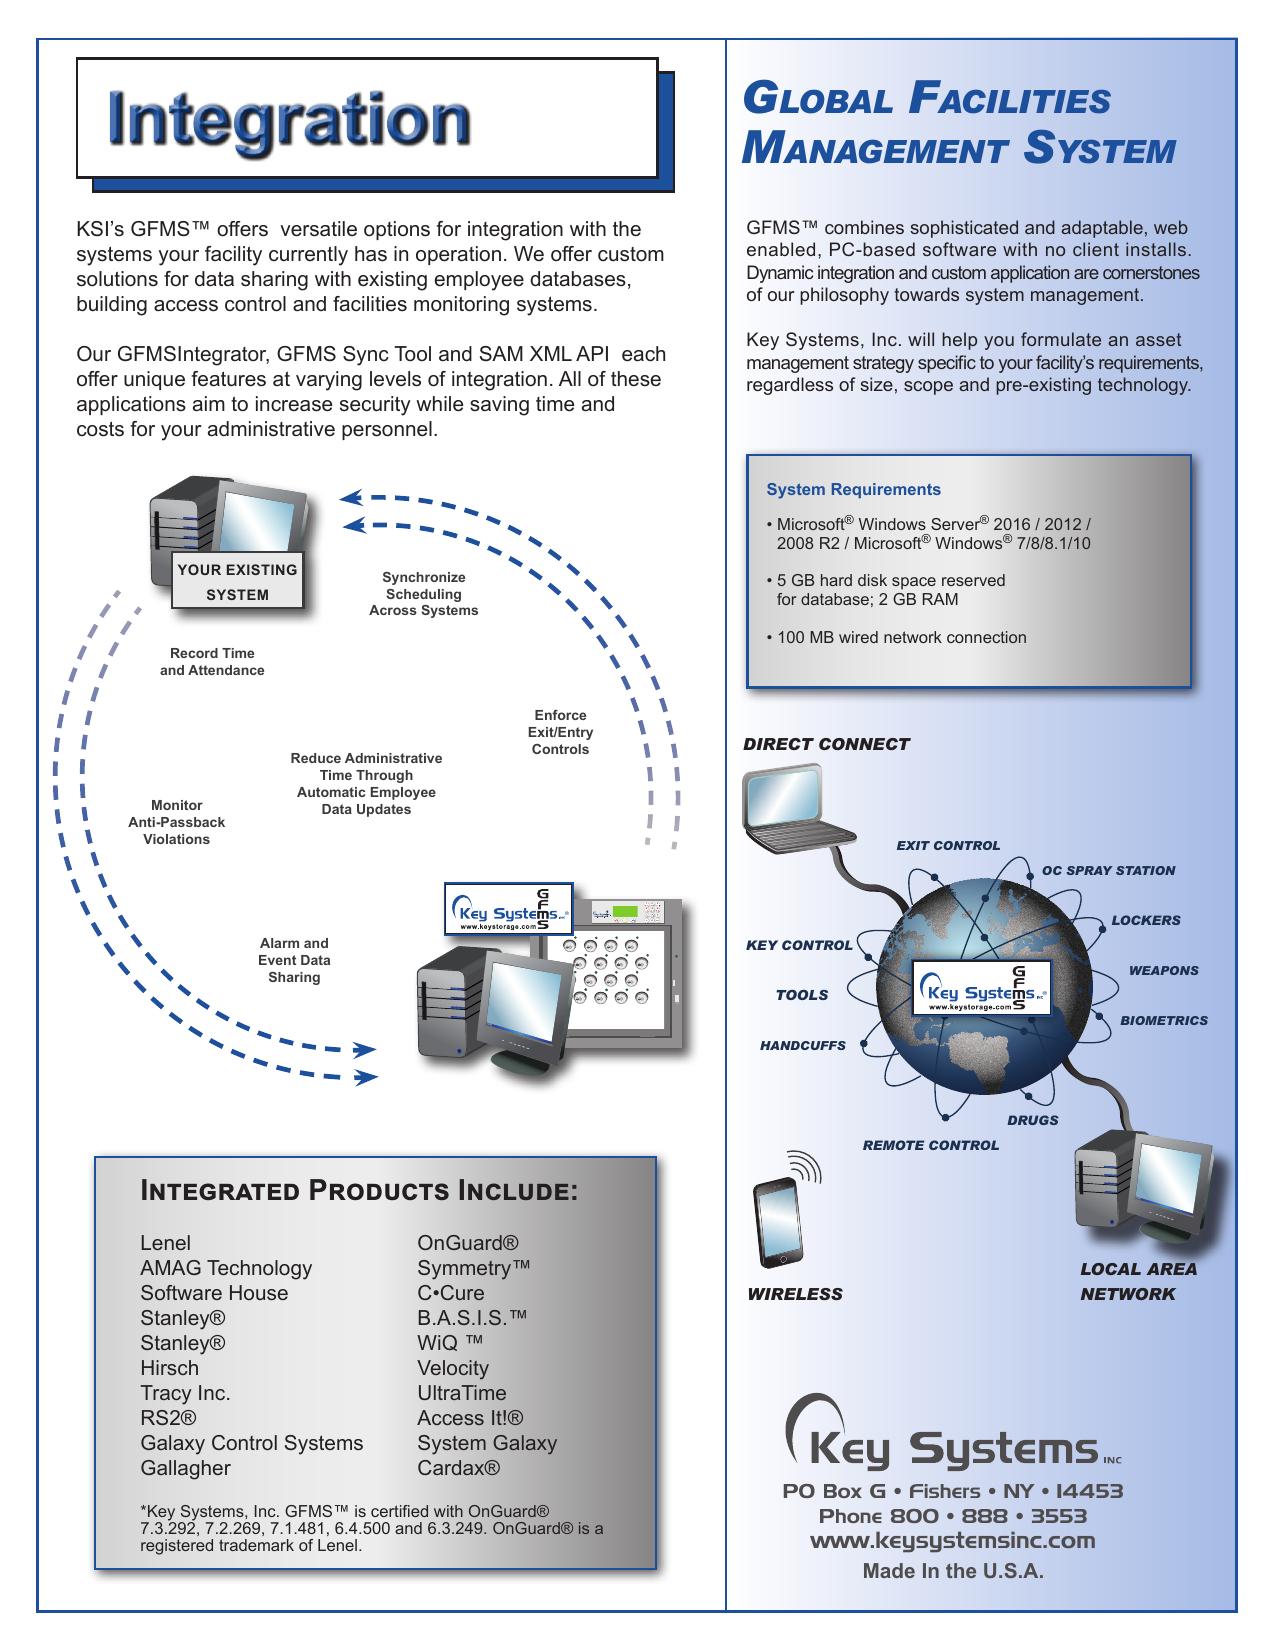 Gfms Integration Key Systems Inc Lenel Wireless Wiring Diagrams